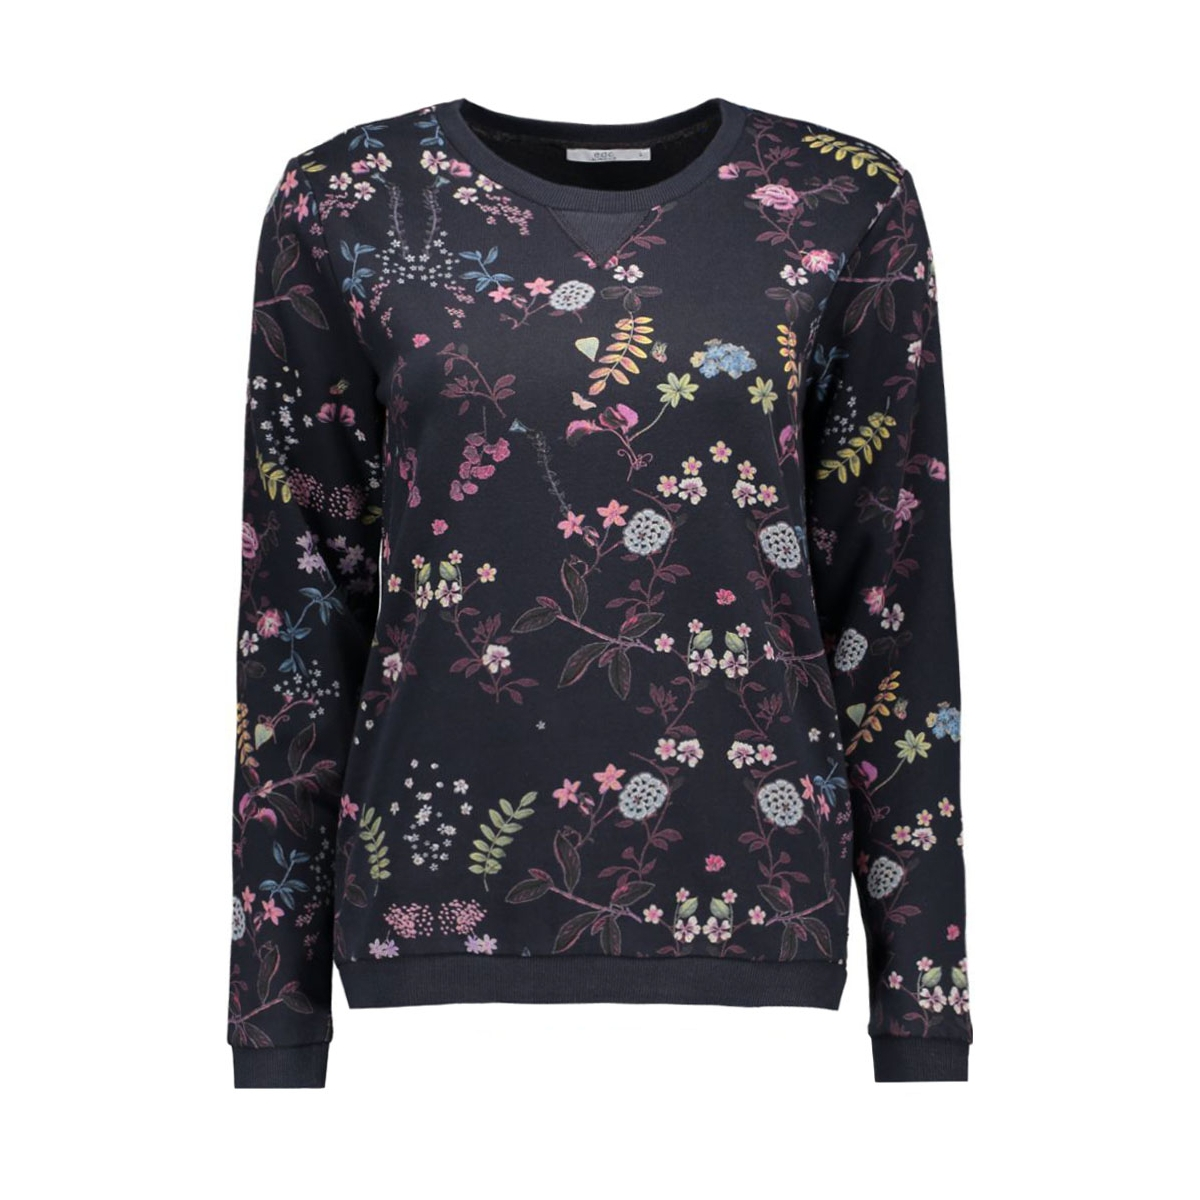 096cc1j002 edc sweater c400